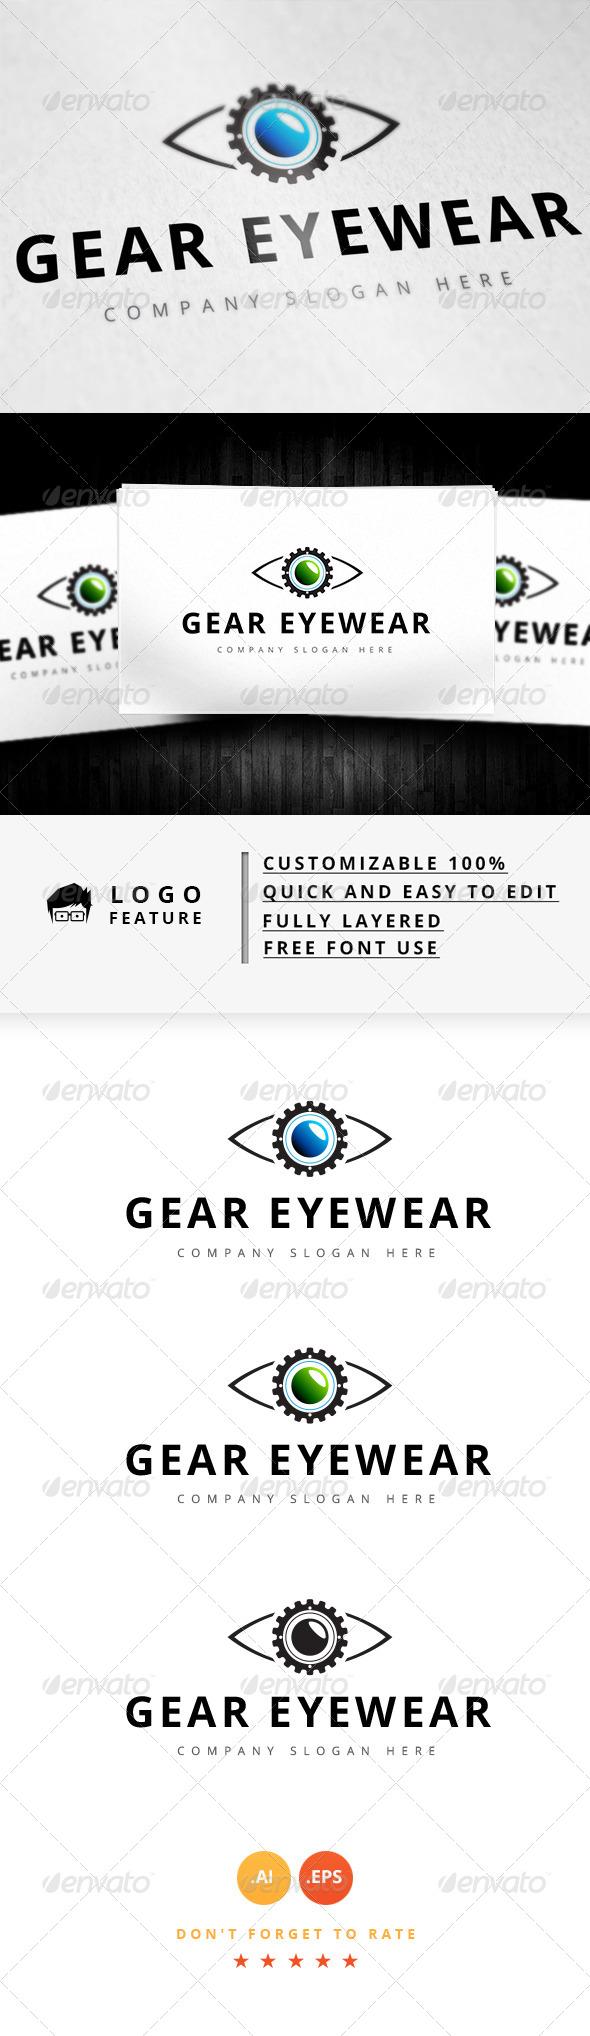 GraphicRiver Gear Eyewear Logo 8187839